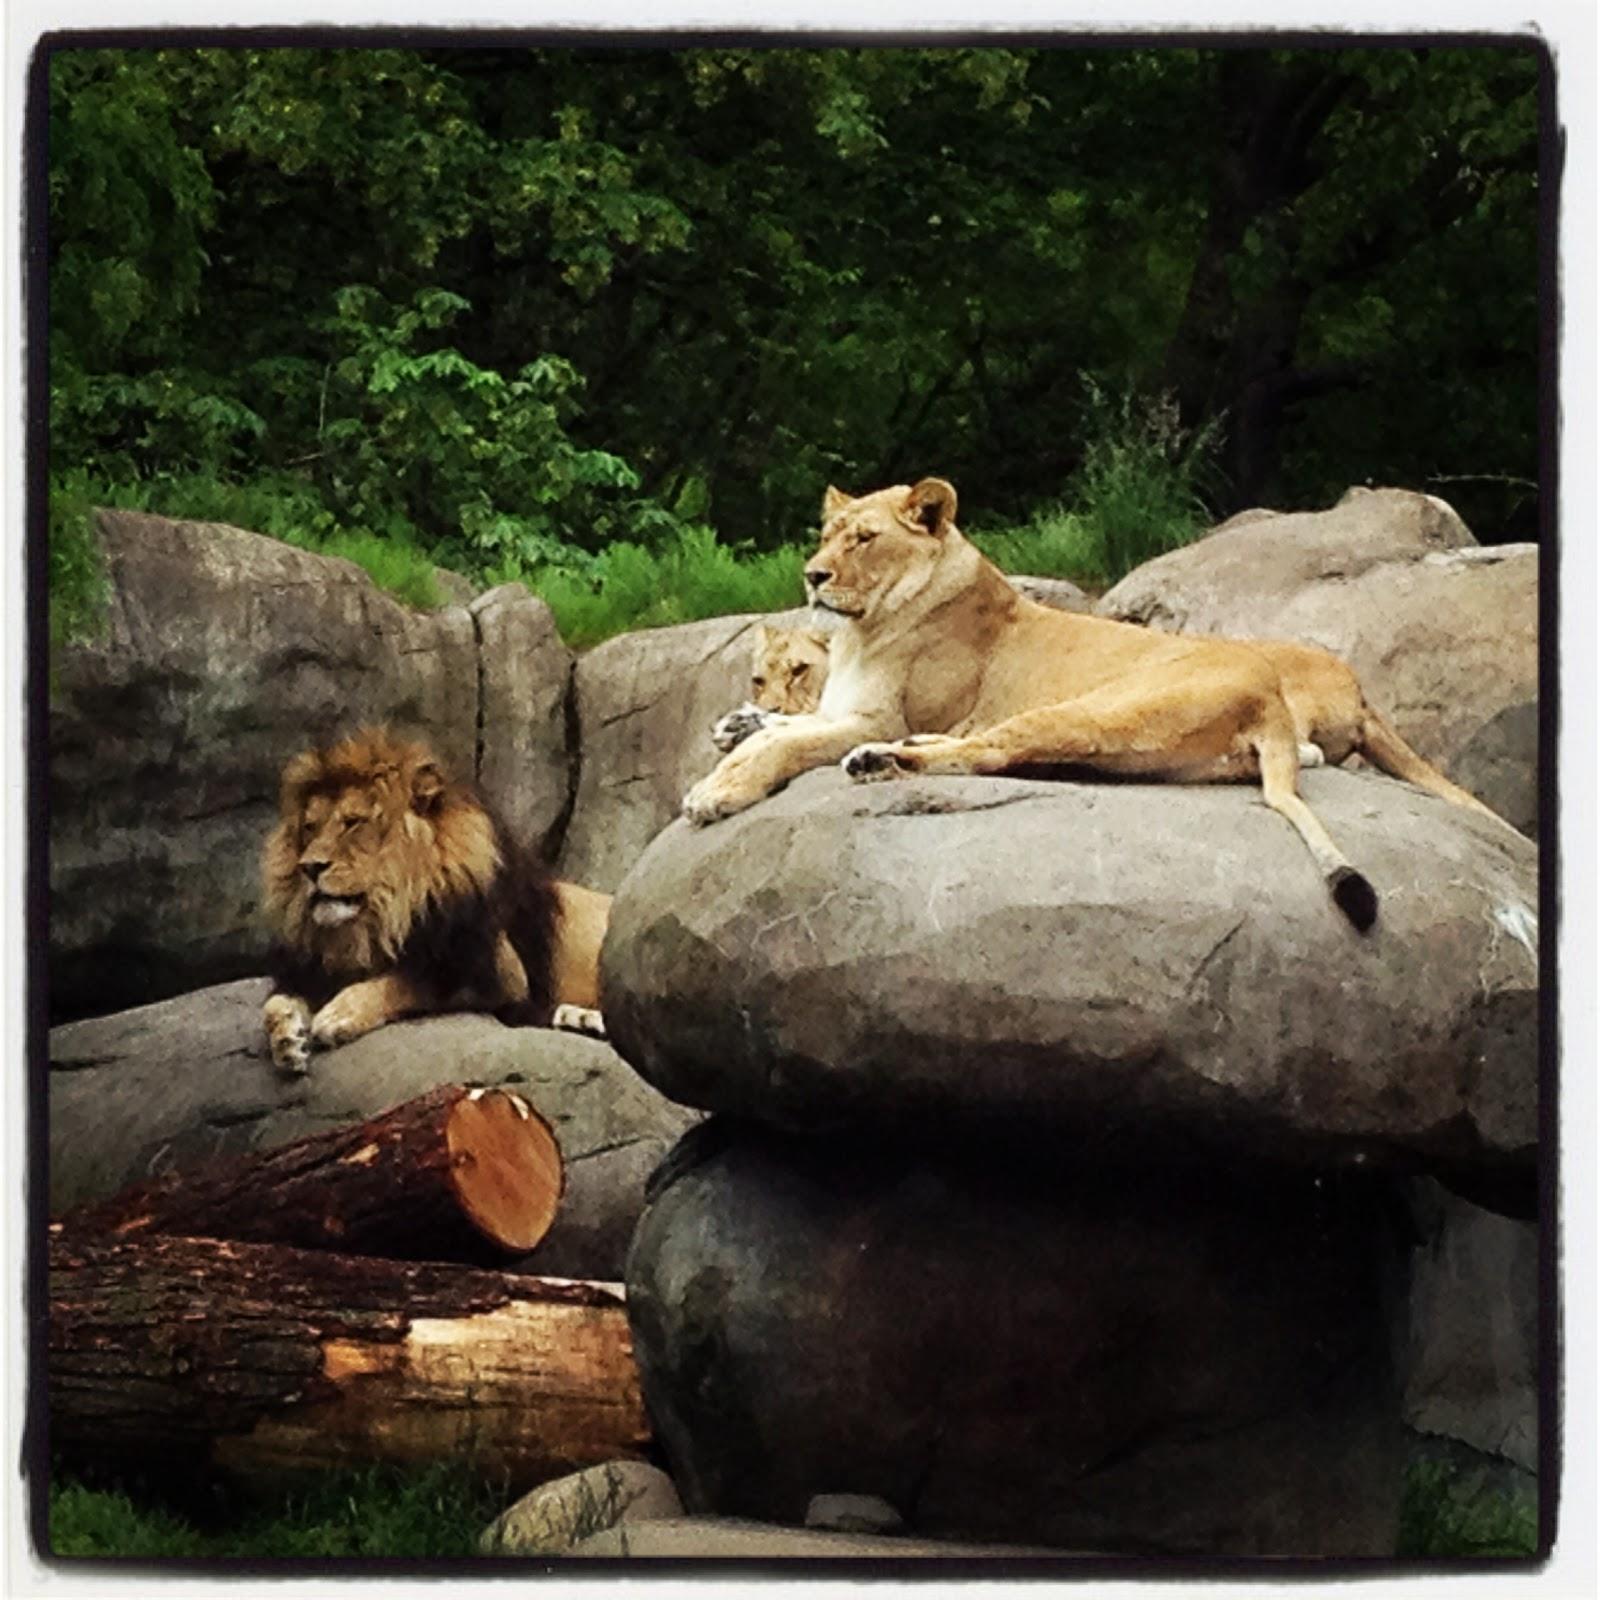 video portland zoo - HD1600×1600